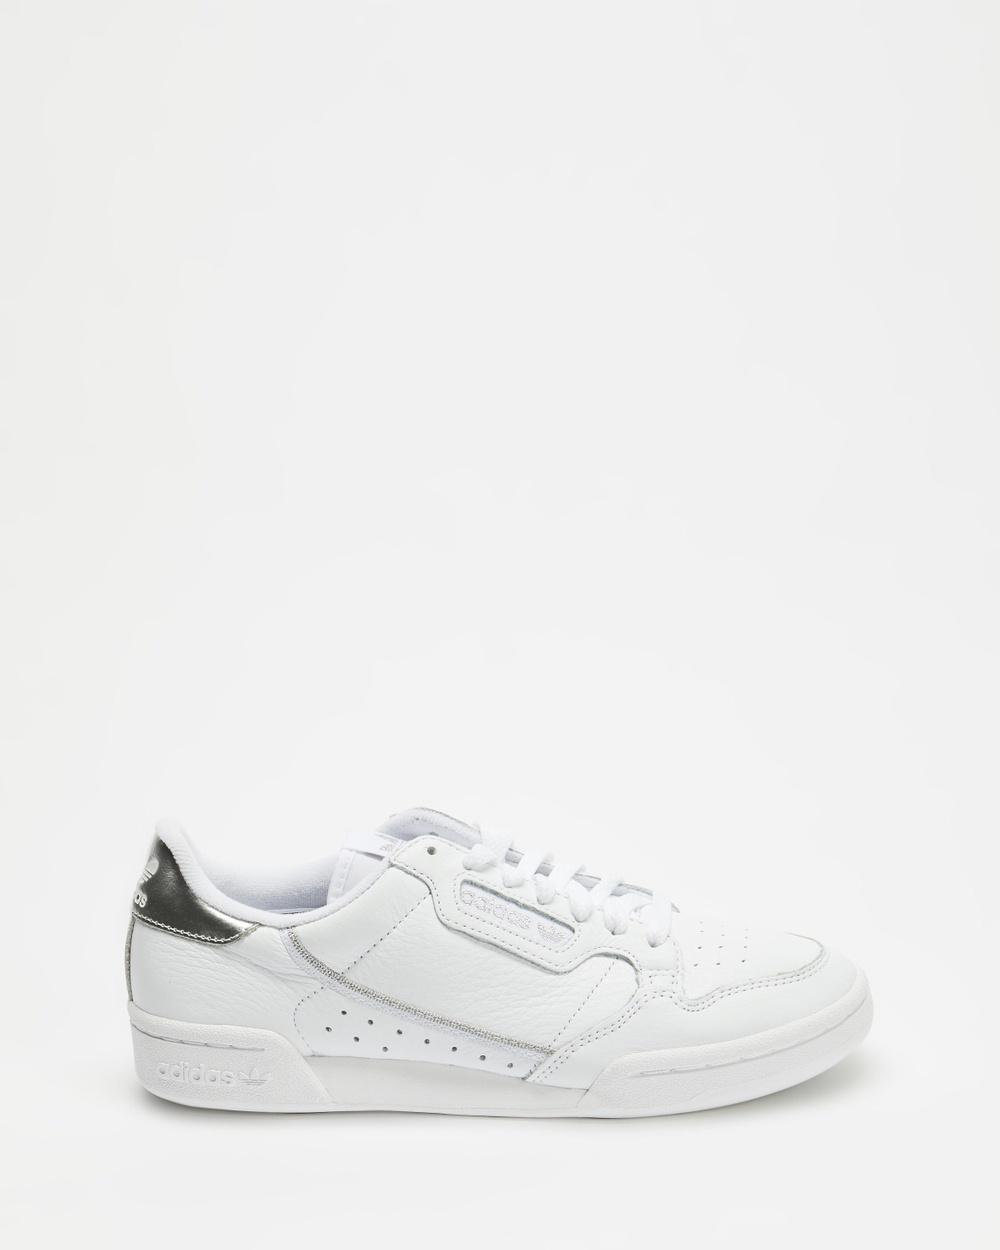 adidas Originals Continental 80 Women's Sneakers Cloud White, Cloud White & Silver Metallic